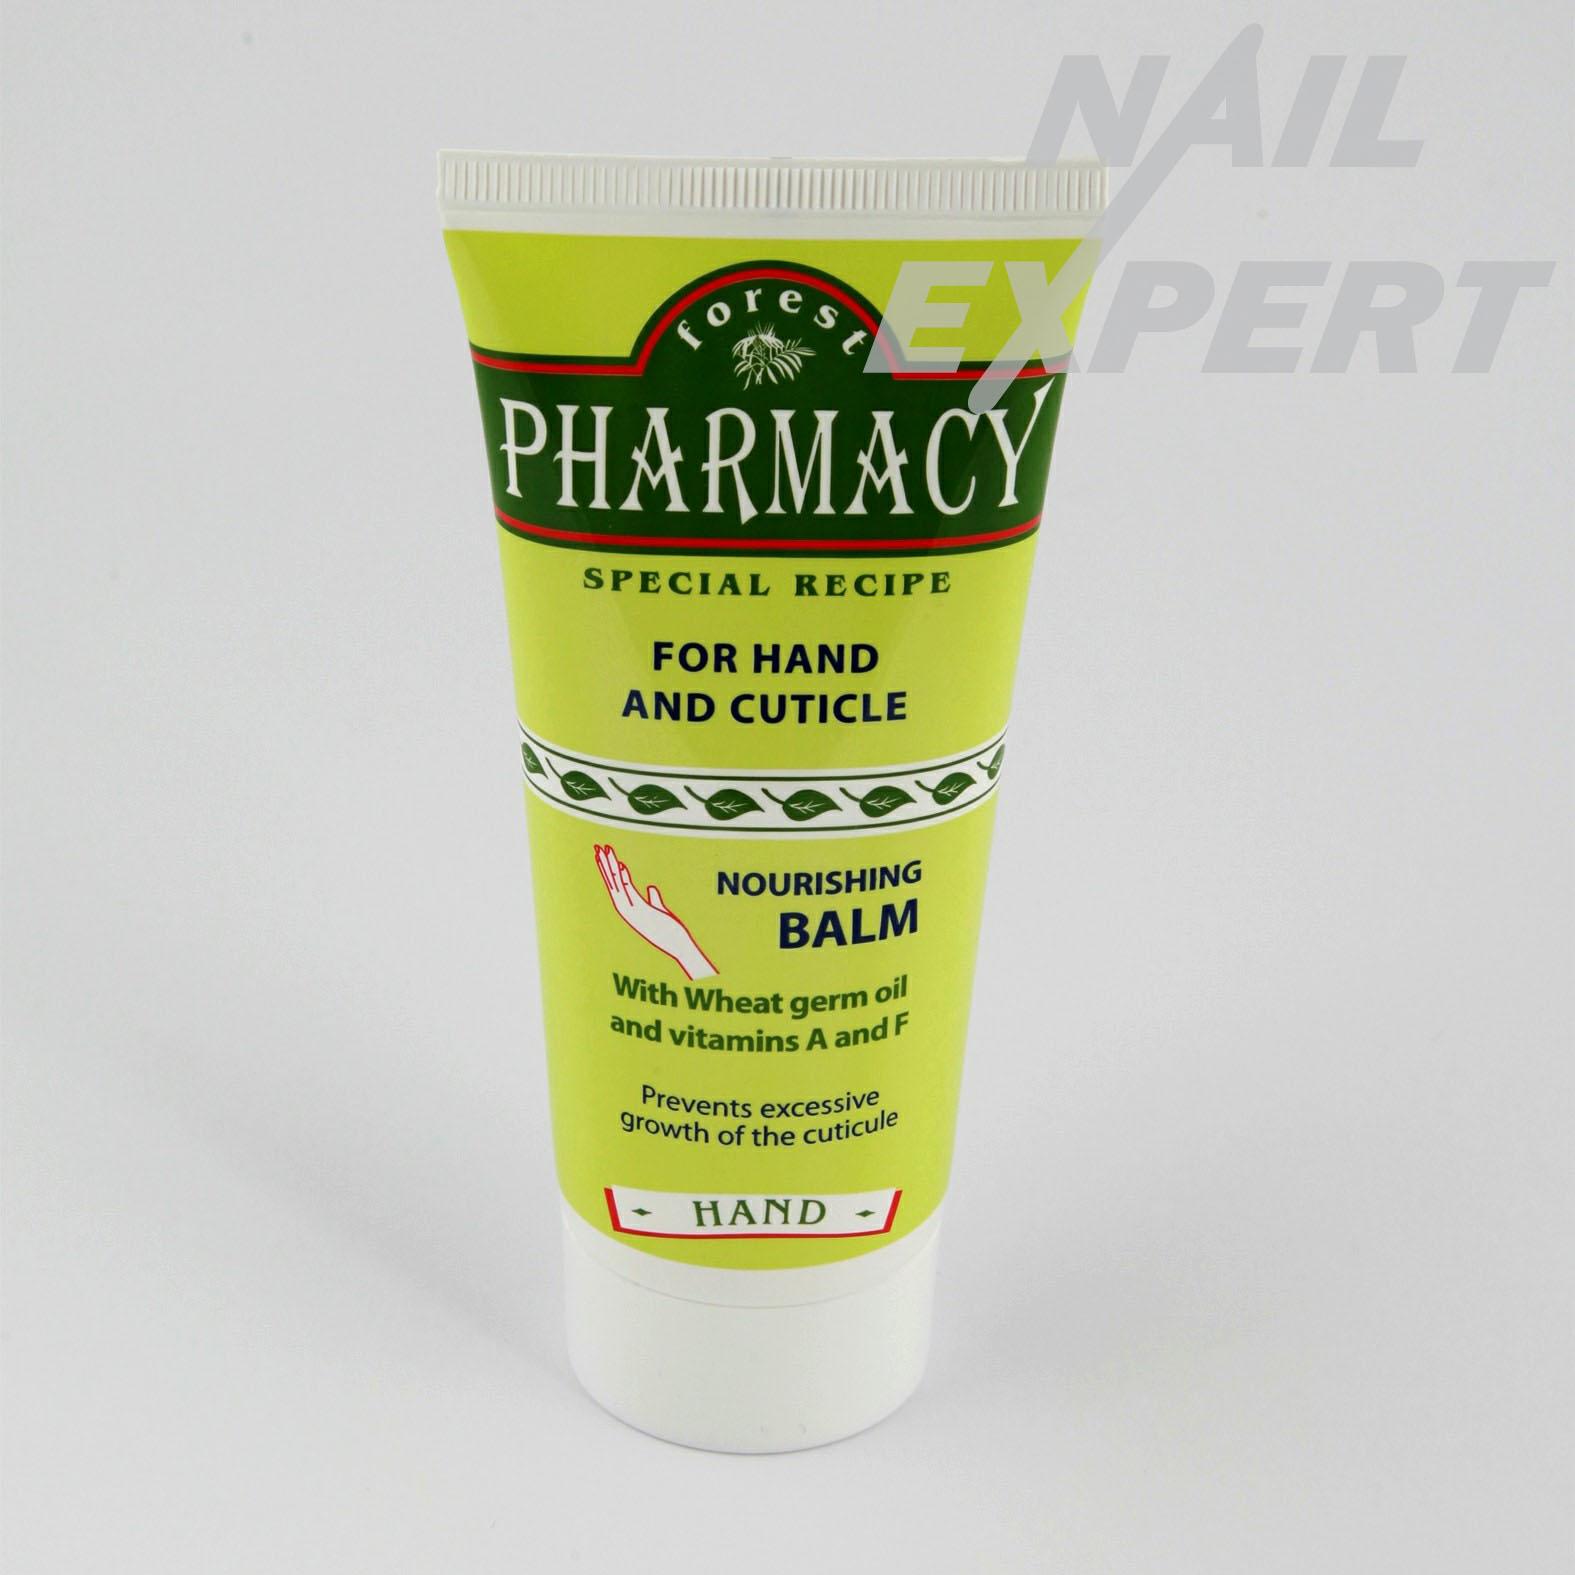 Nail Expert Nourishing balm